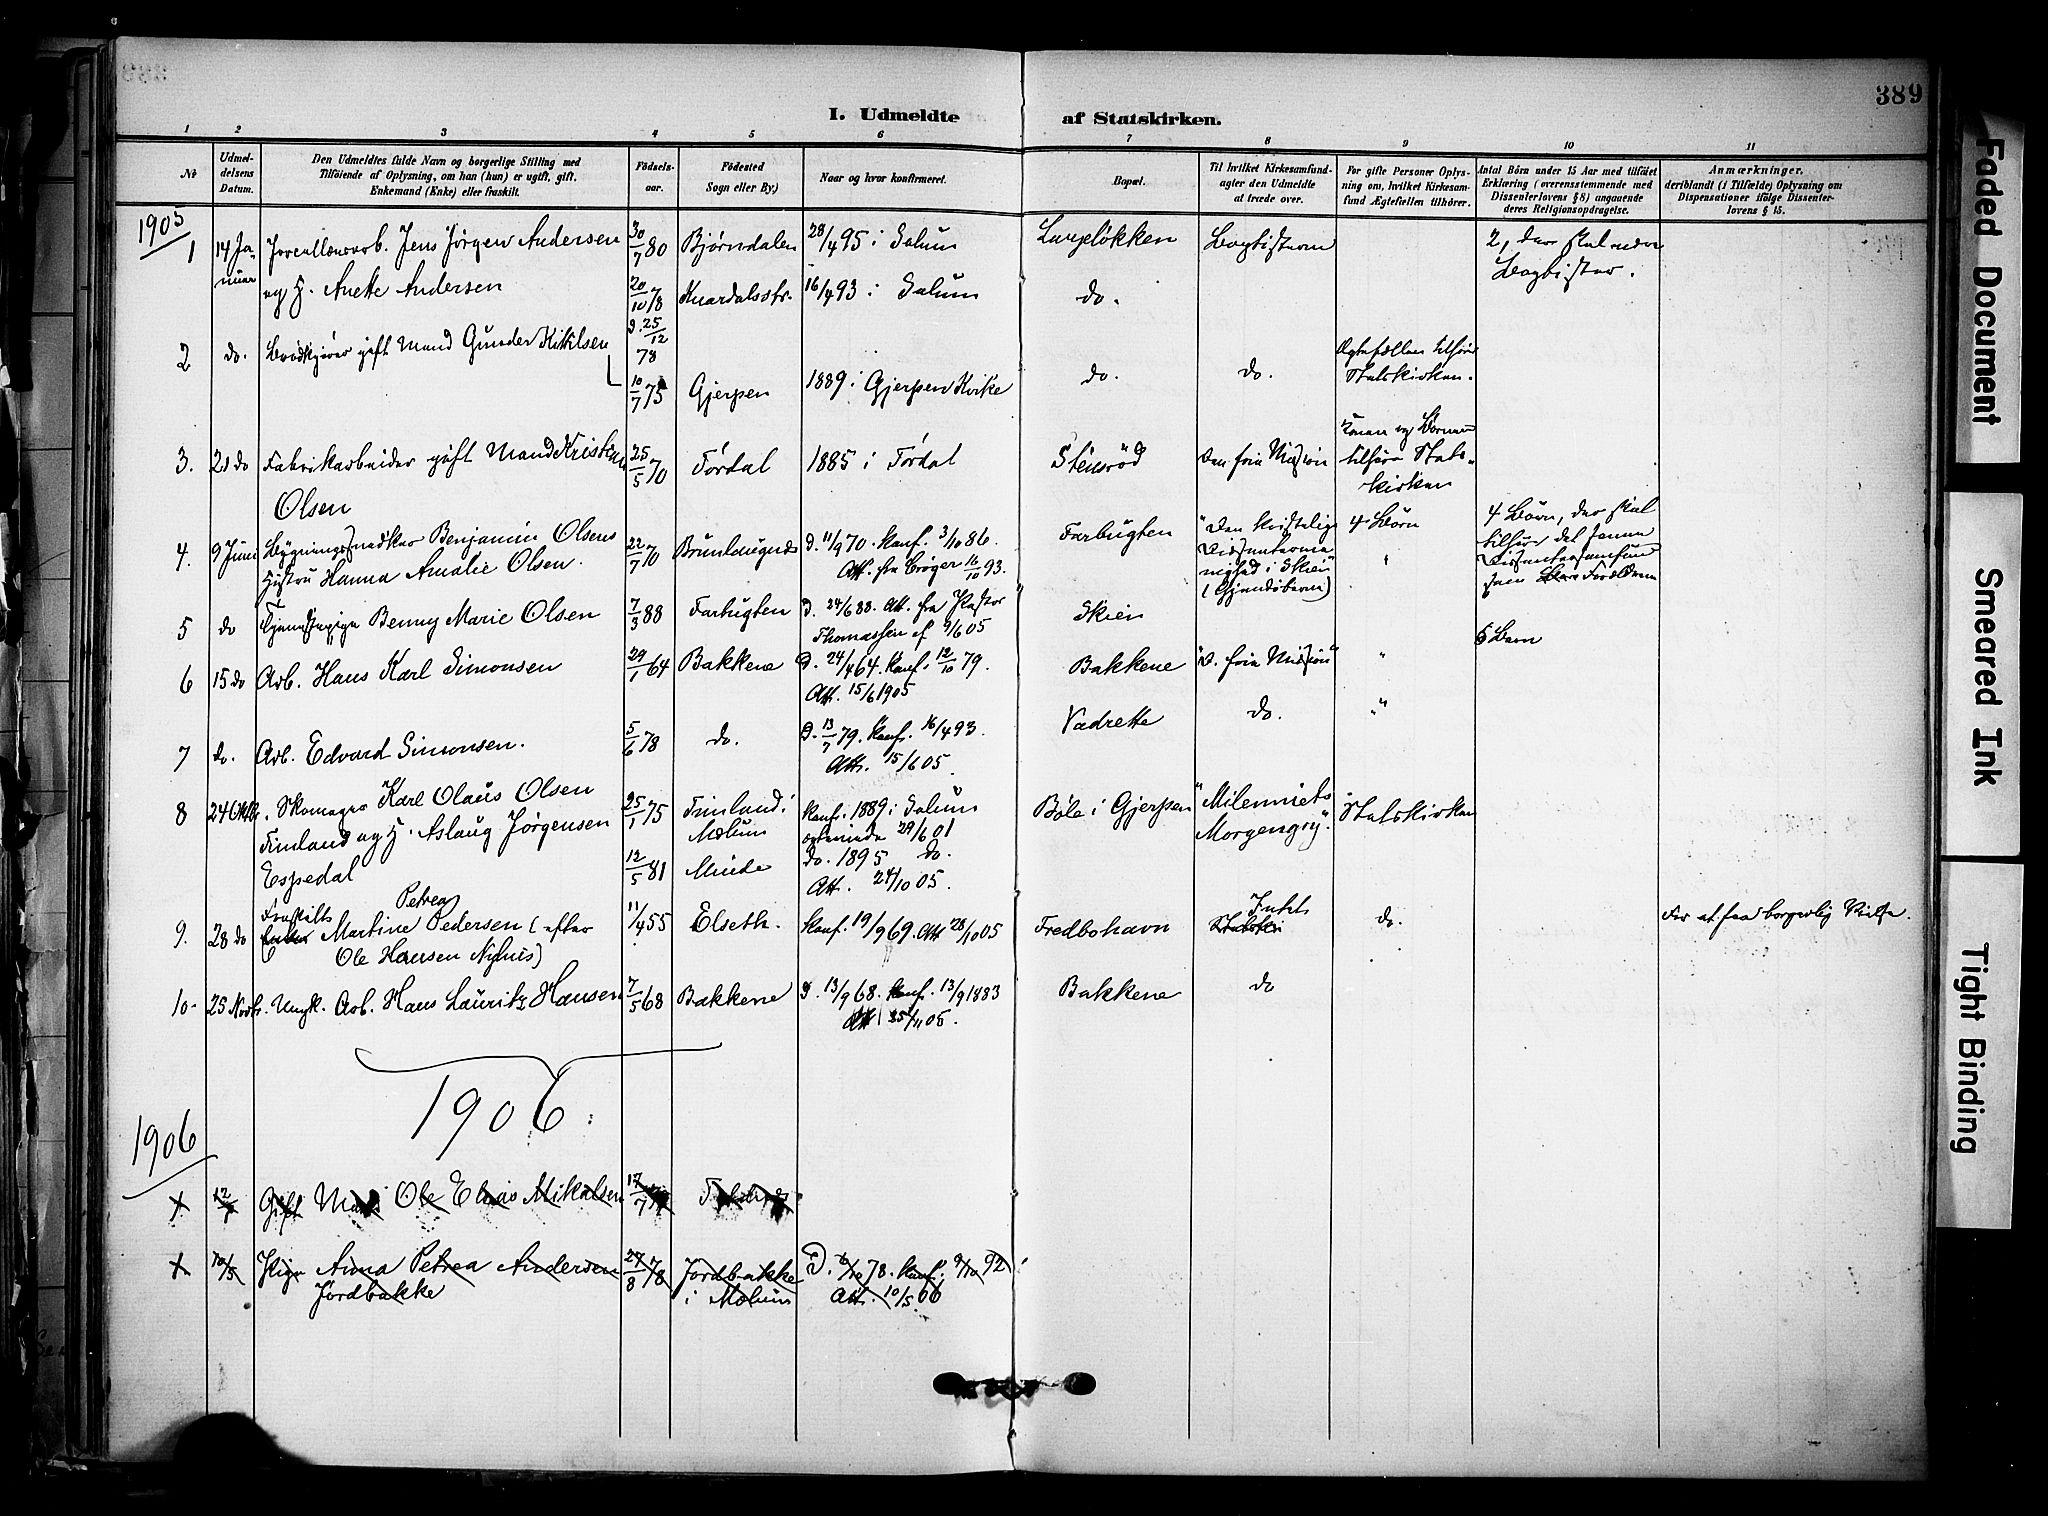 SAKO, Solum kirkebøker, F/Fa/L0011: Ministerialbok nr. I 11, 1898-1909, s. 389